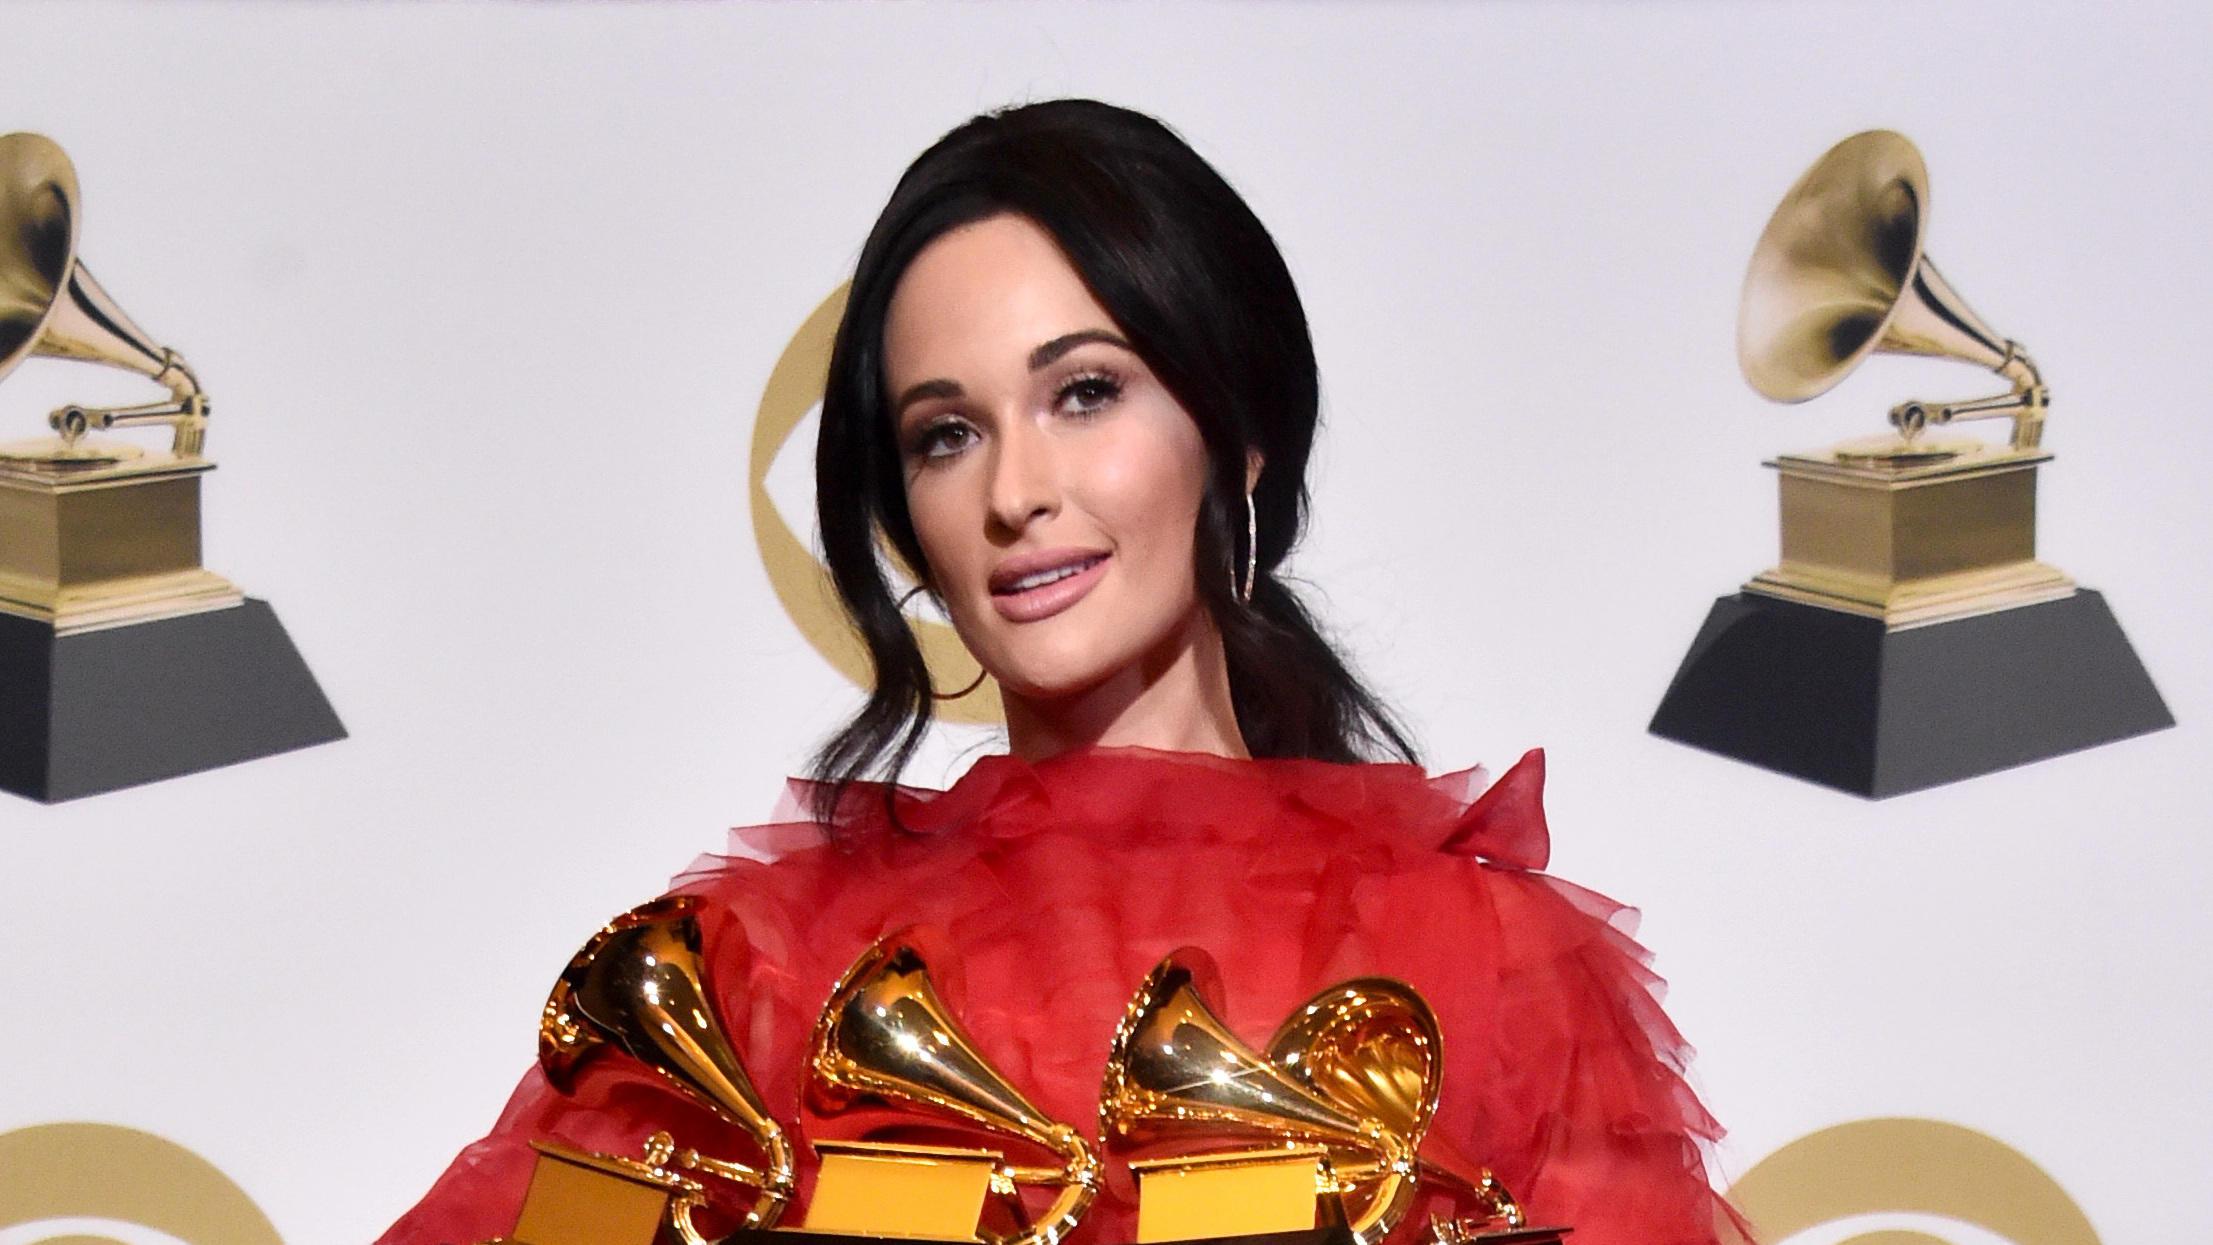 Grammys: 10 Takeaways From The 2019 Grammy Awards